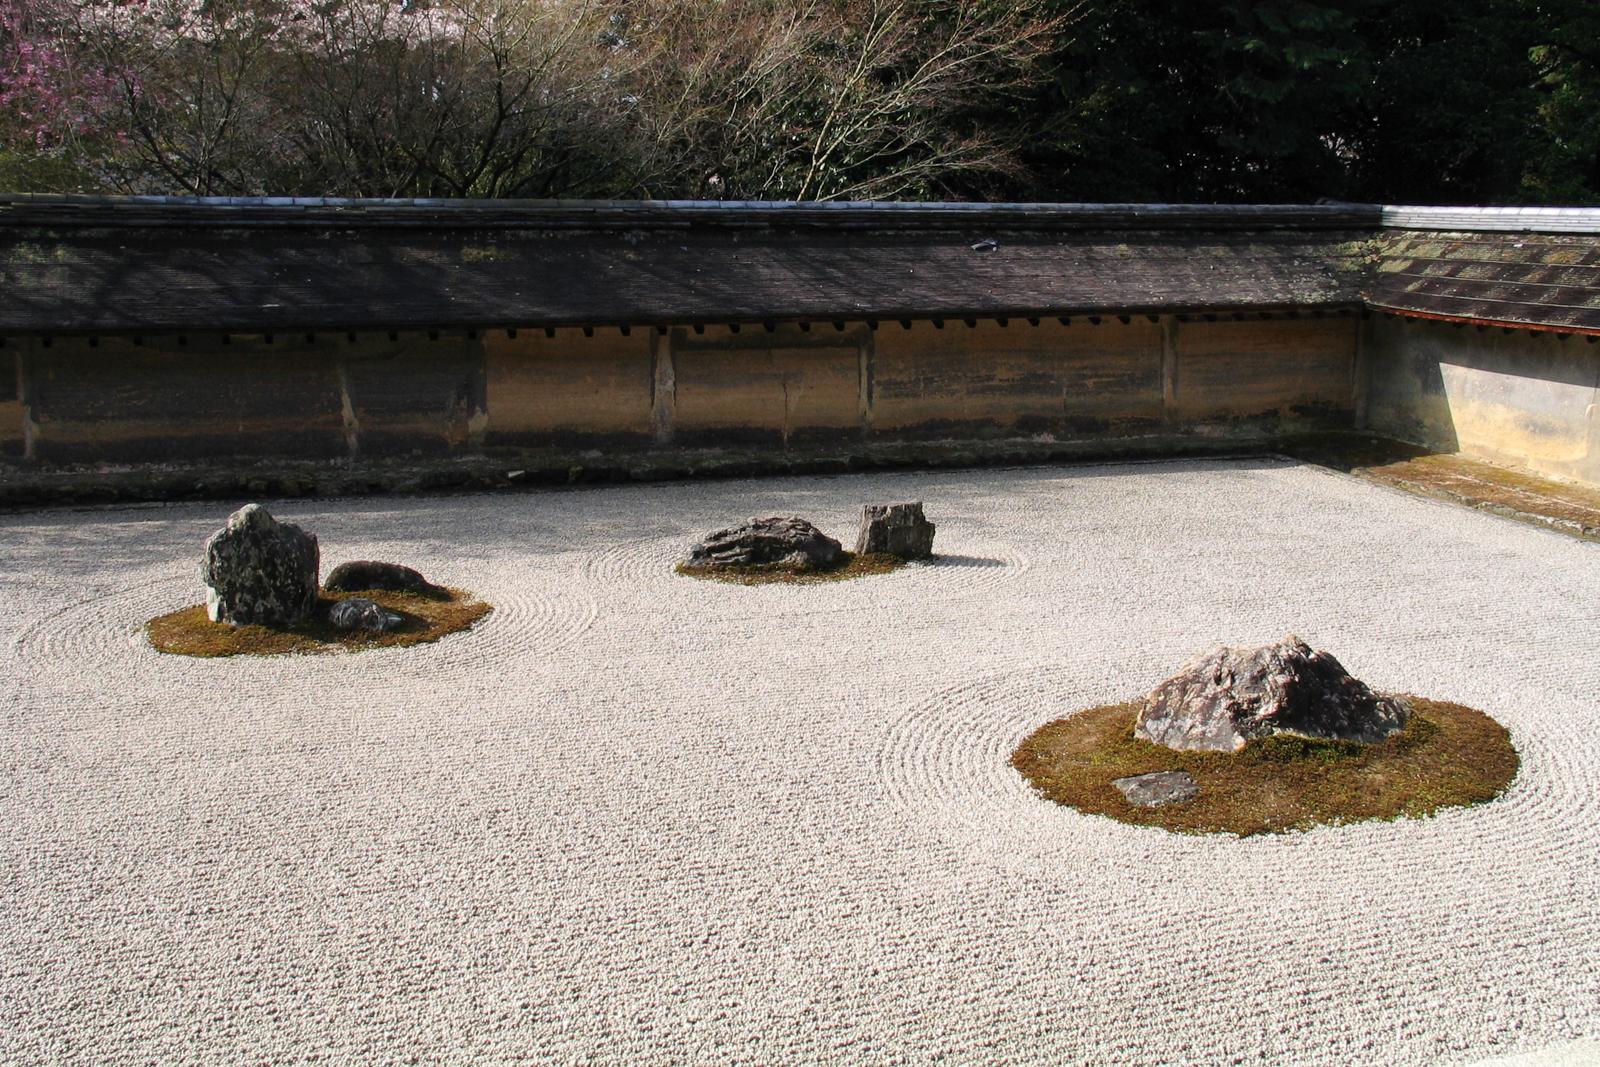 File:RyoanJi-Dry garden.jpg